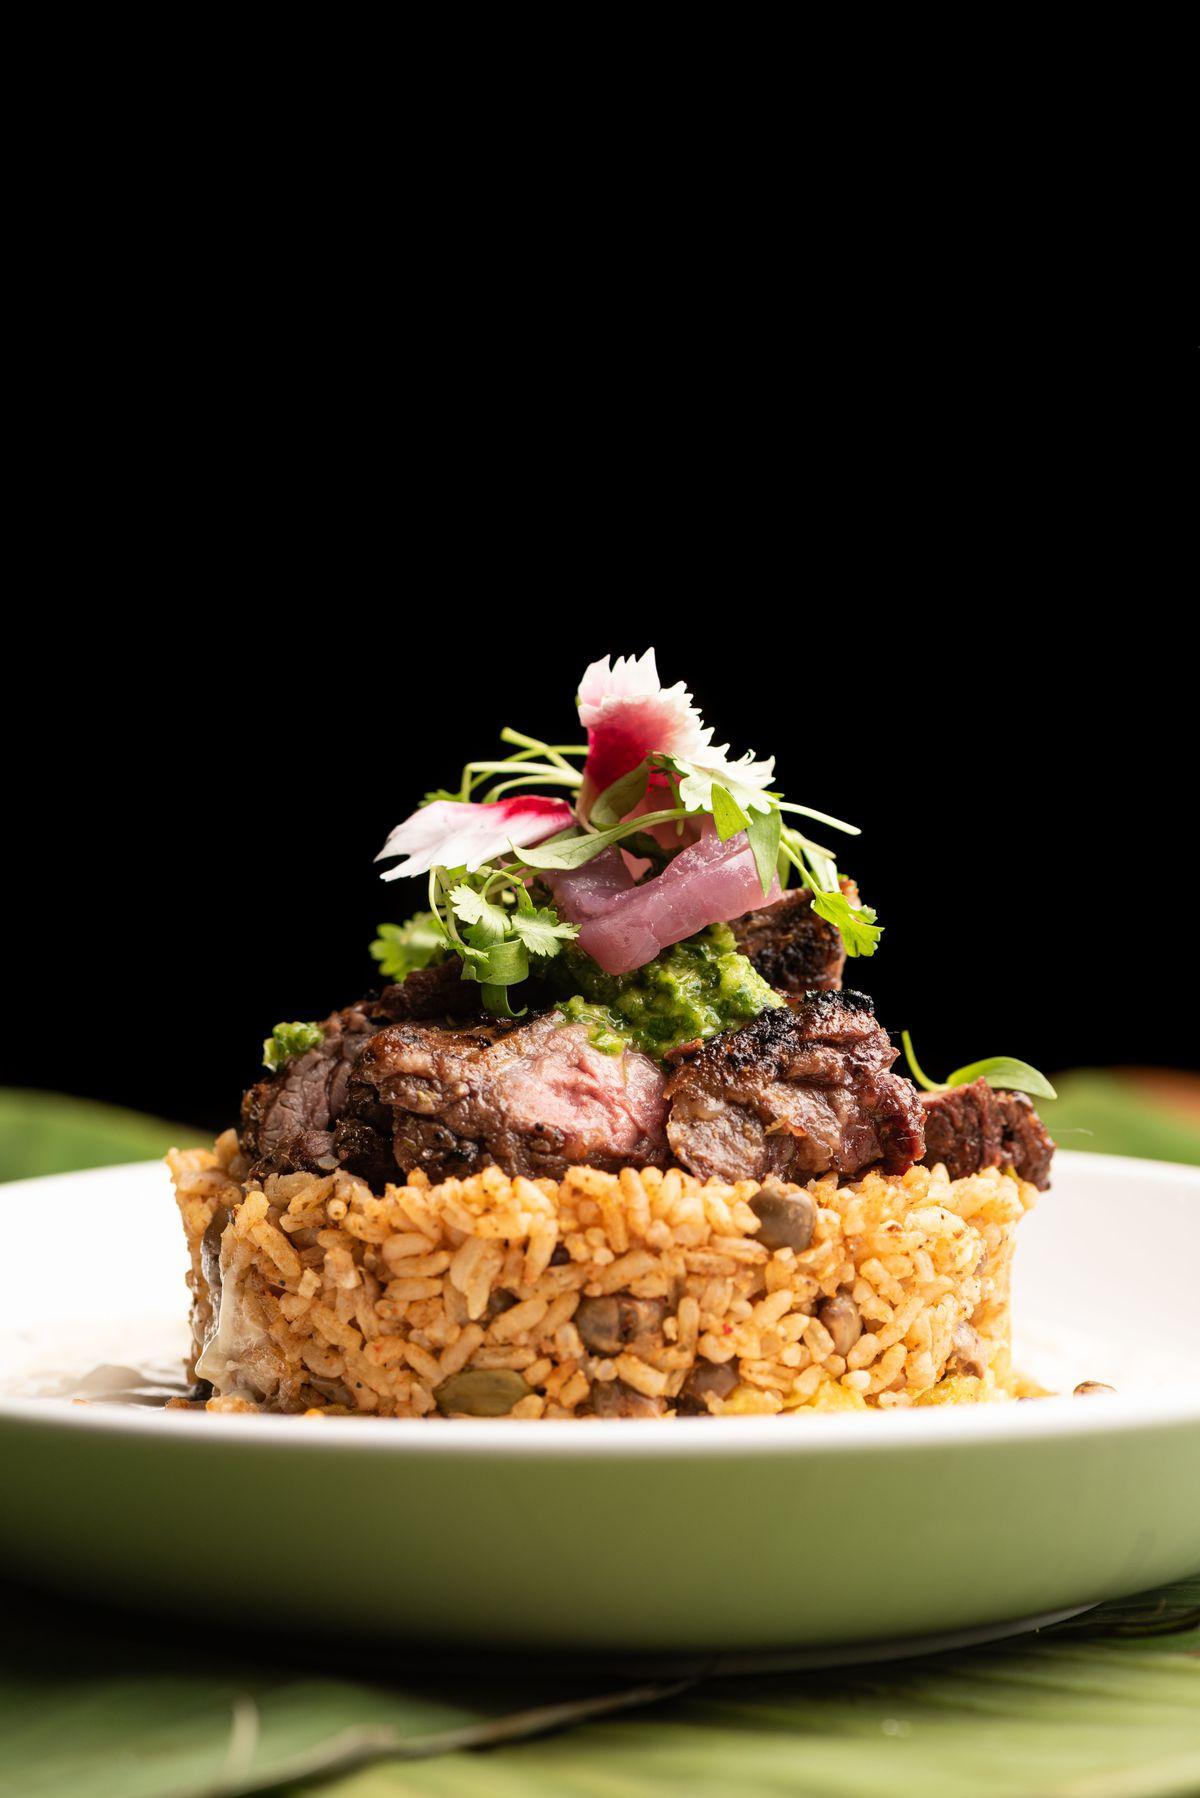 El Morro, mofongo with grilled steak, chimichurri, and truffle cream sauce.